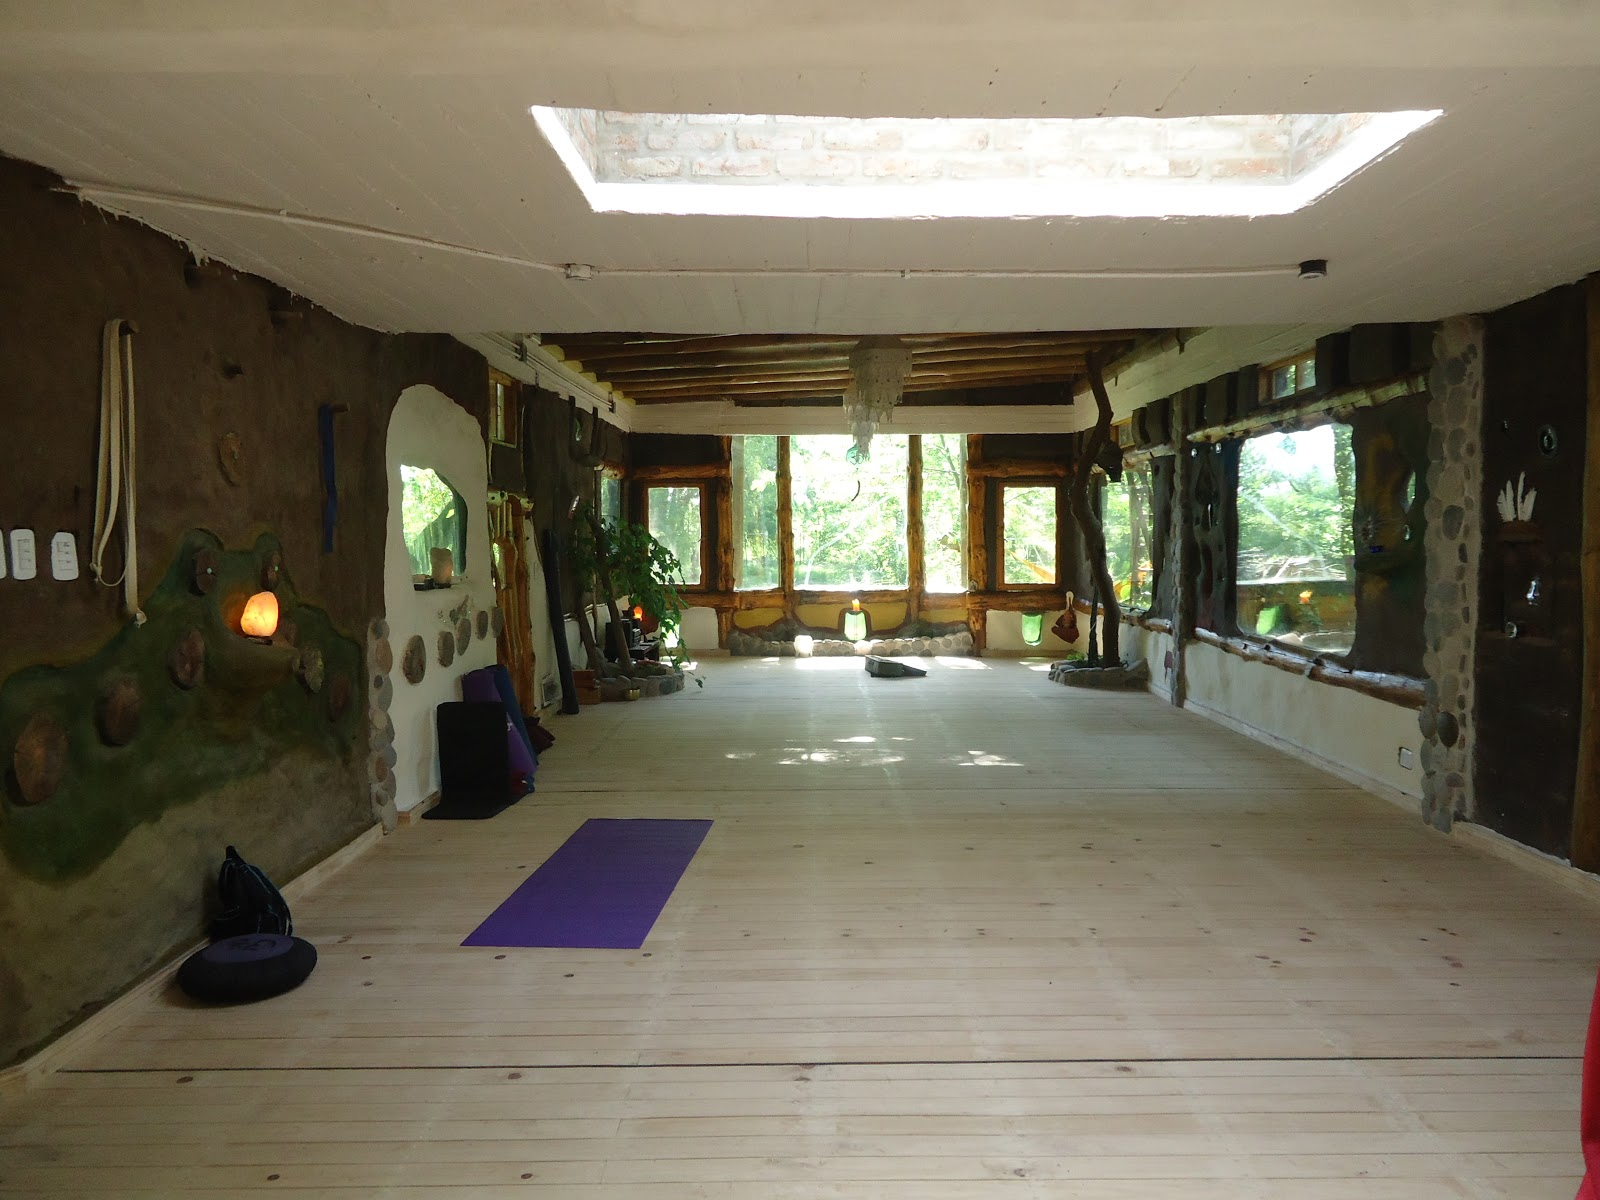 Decoraciones Yoga ~ M?s informaci?n www juanlasoavalon com